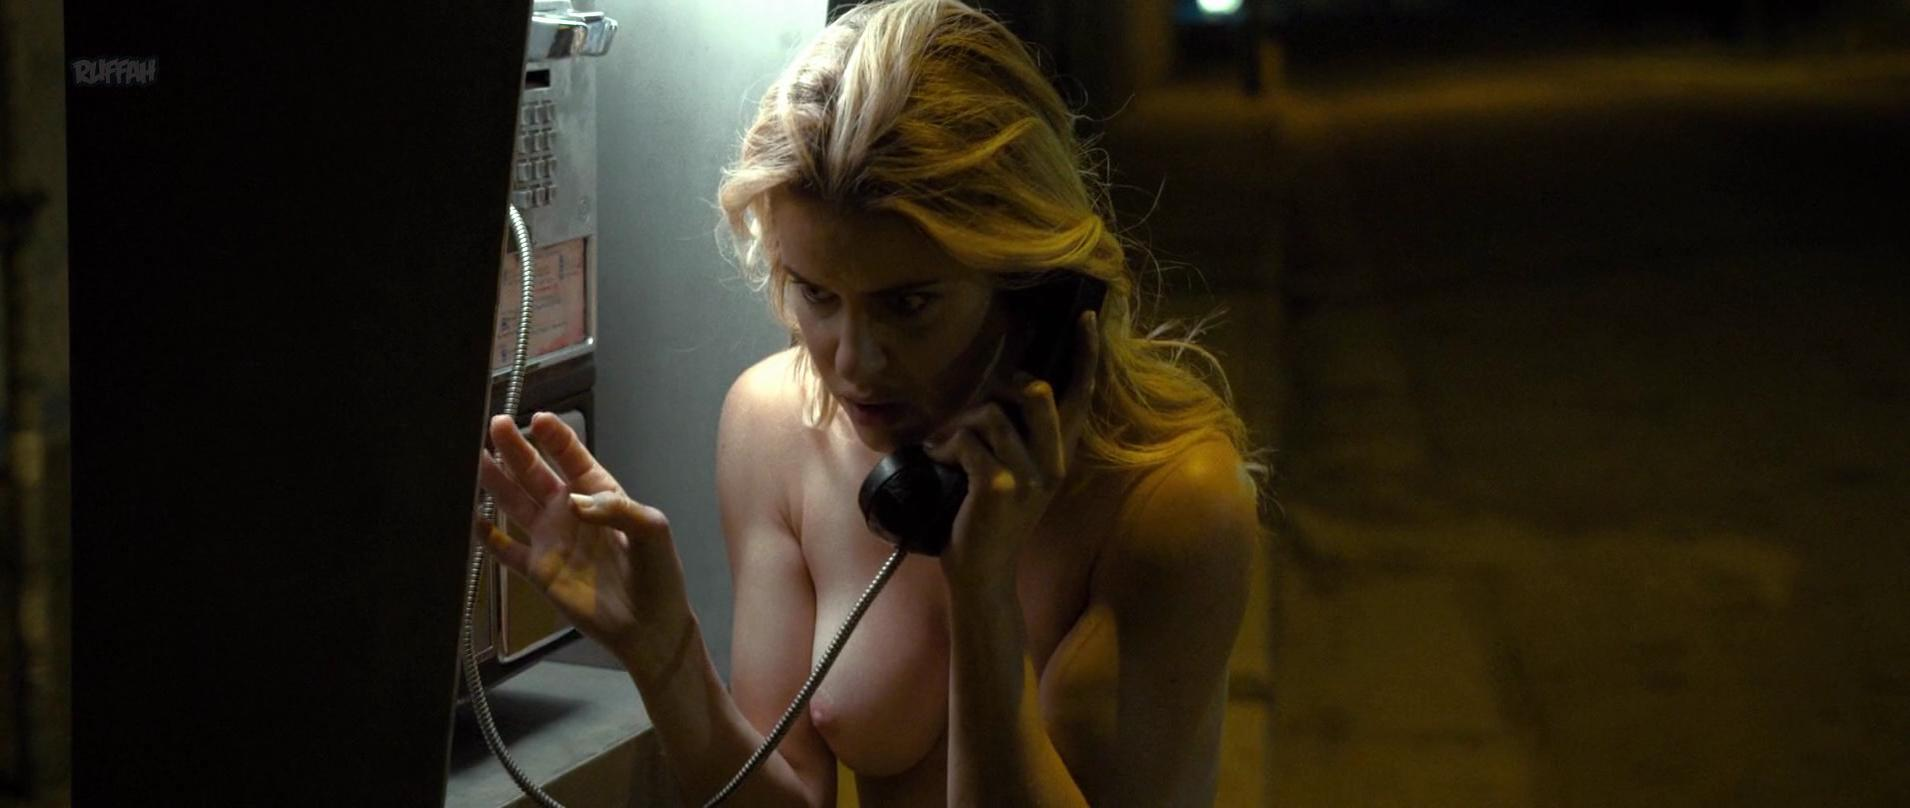 Elisabeth Hower nude - Escape Room (2018)